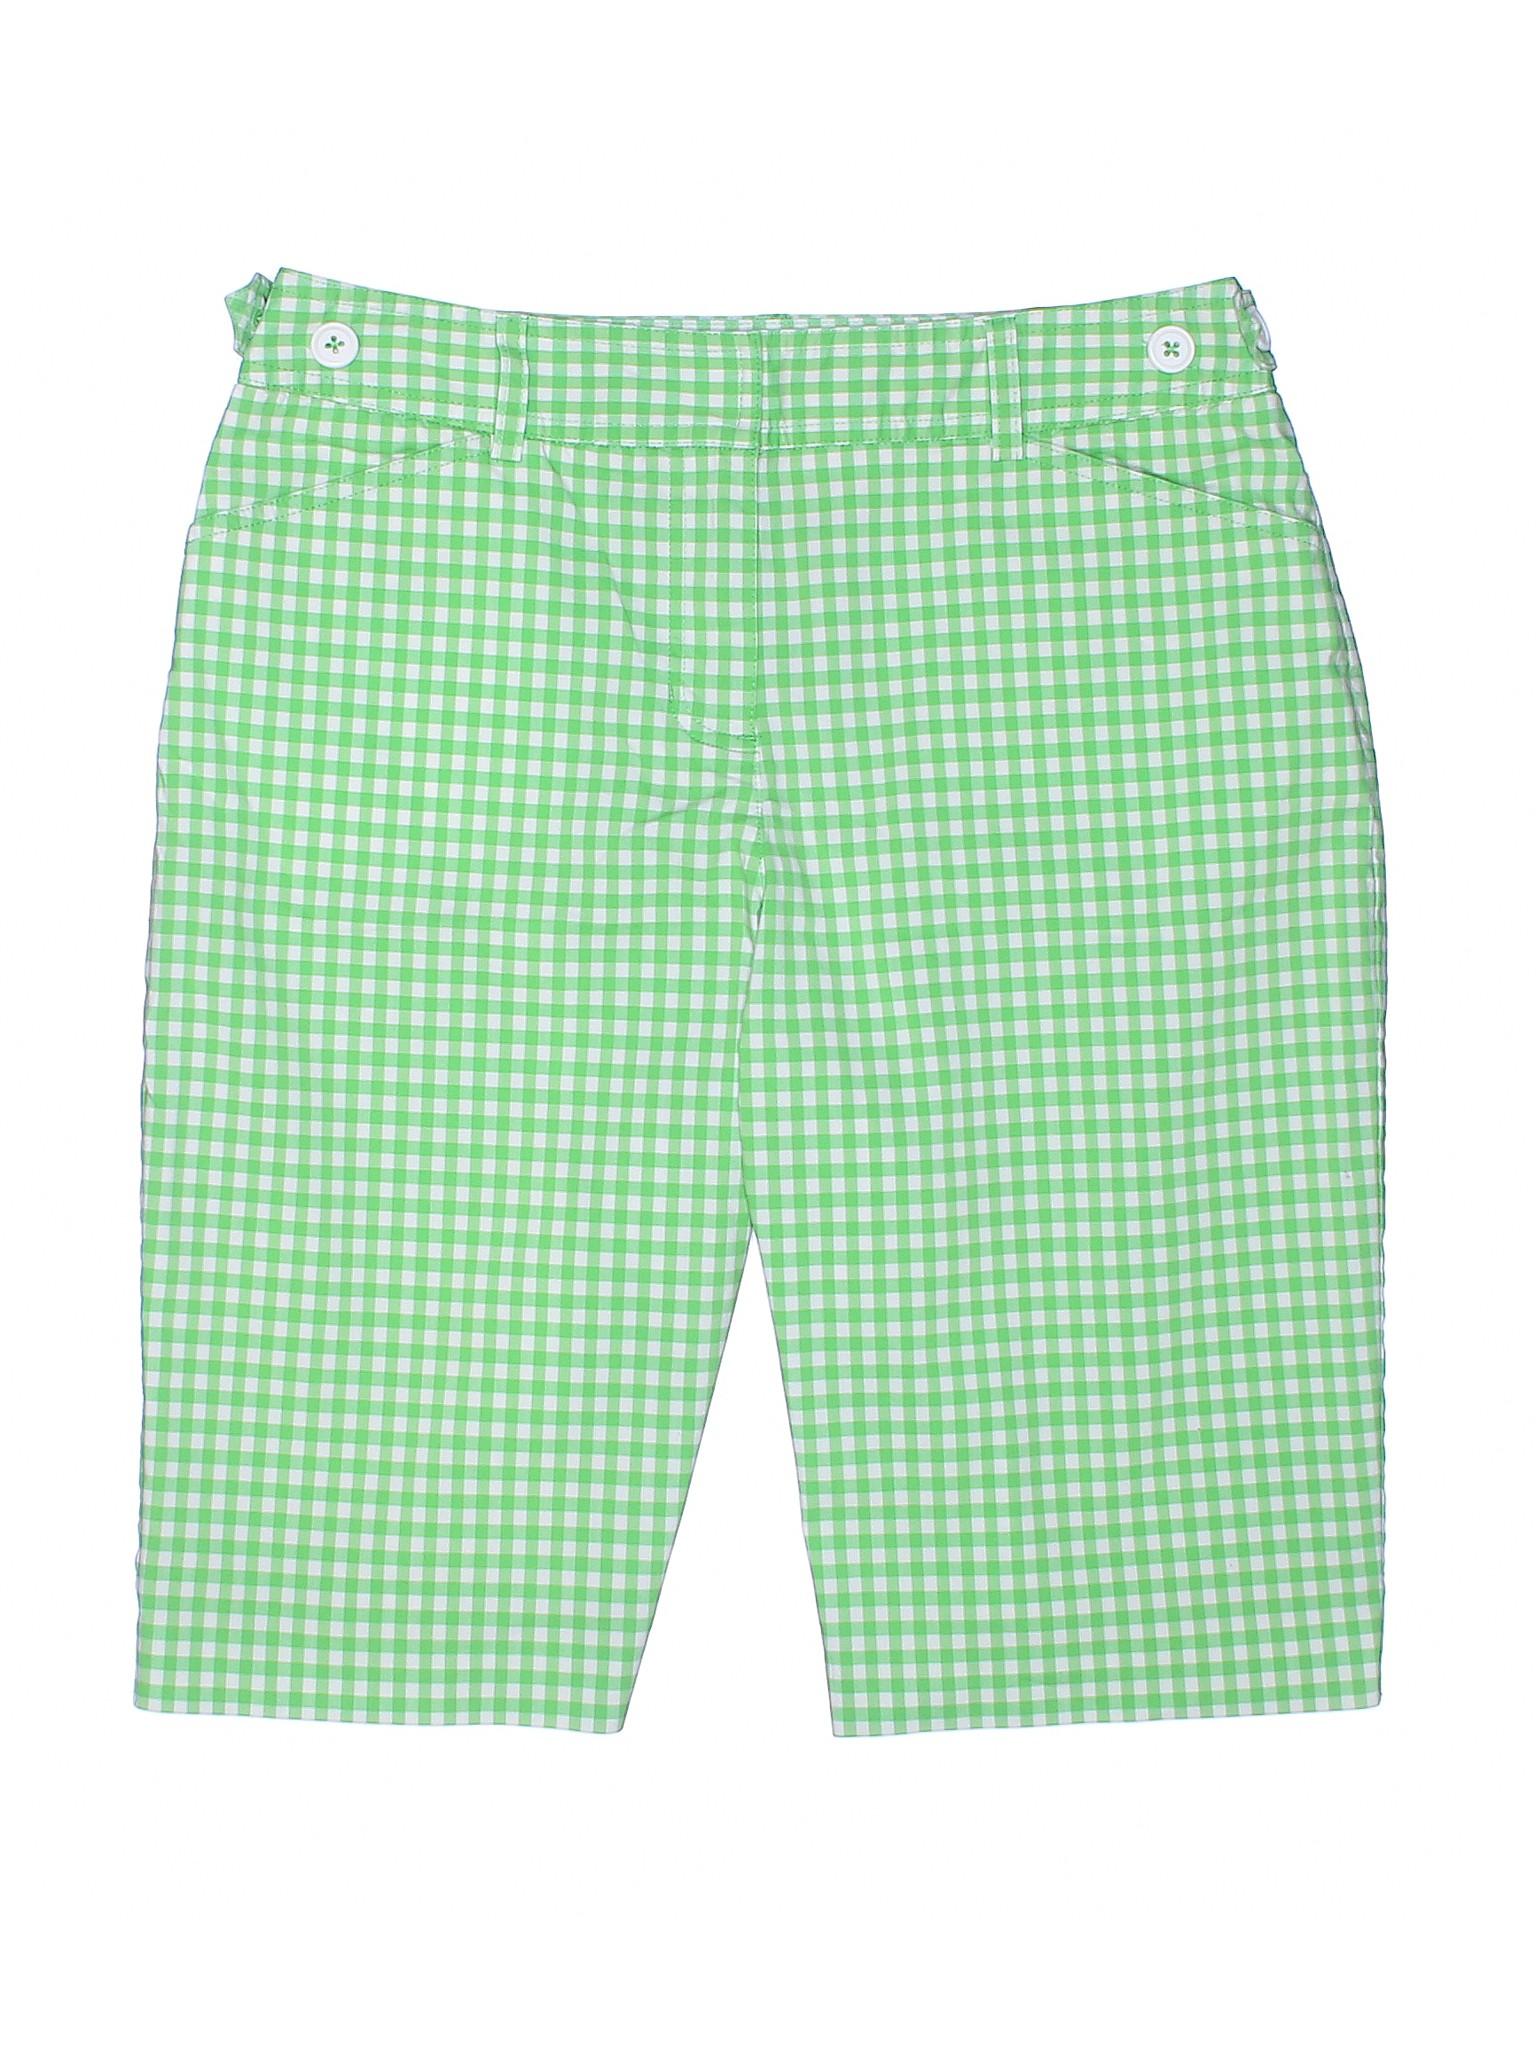 New Shorts winter Boutique Athletic Sport York Jones qn71E